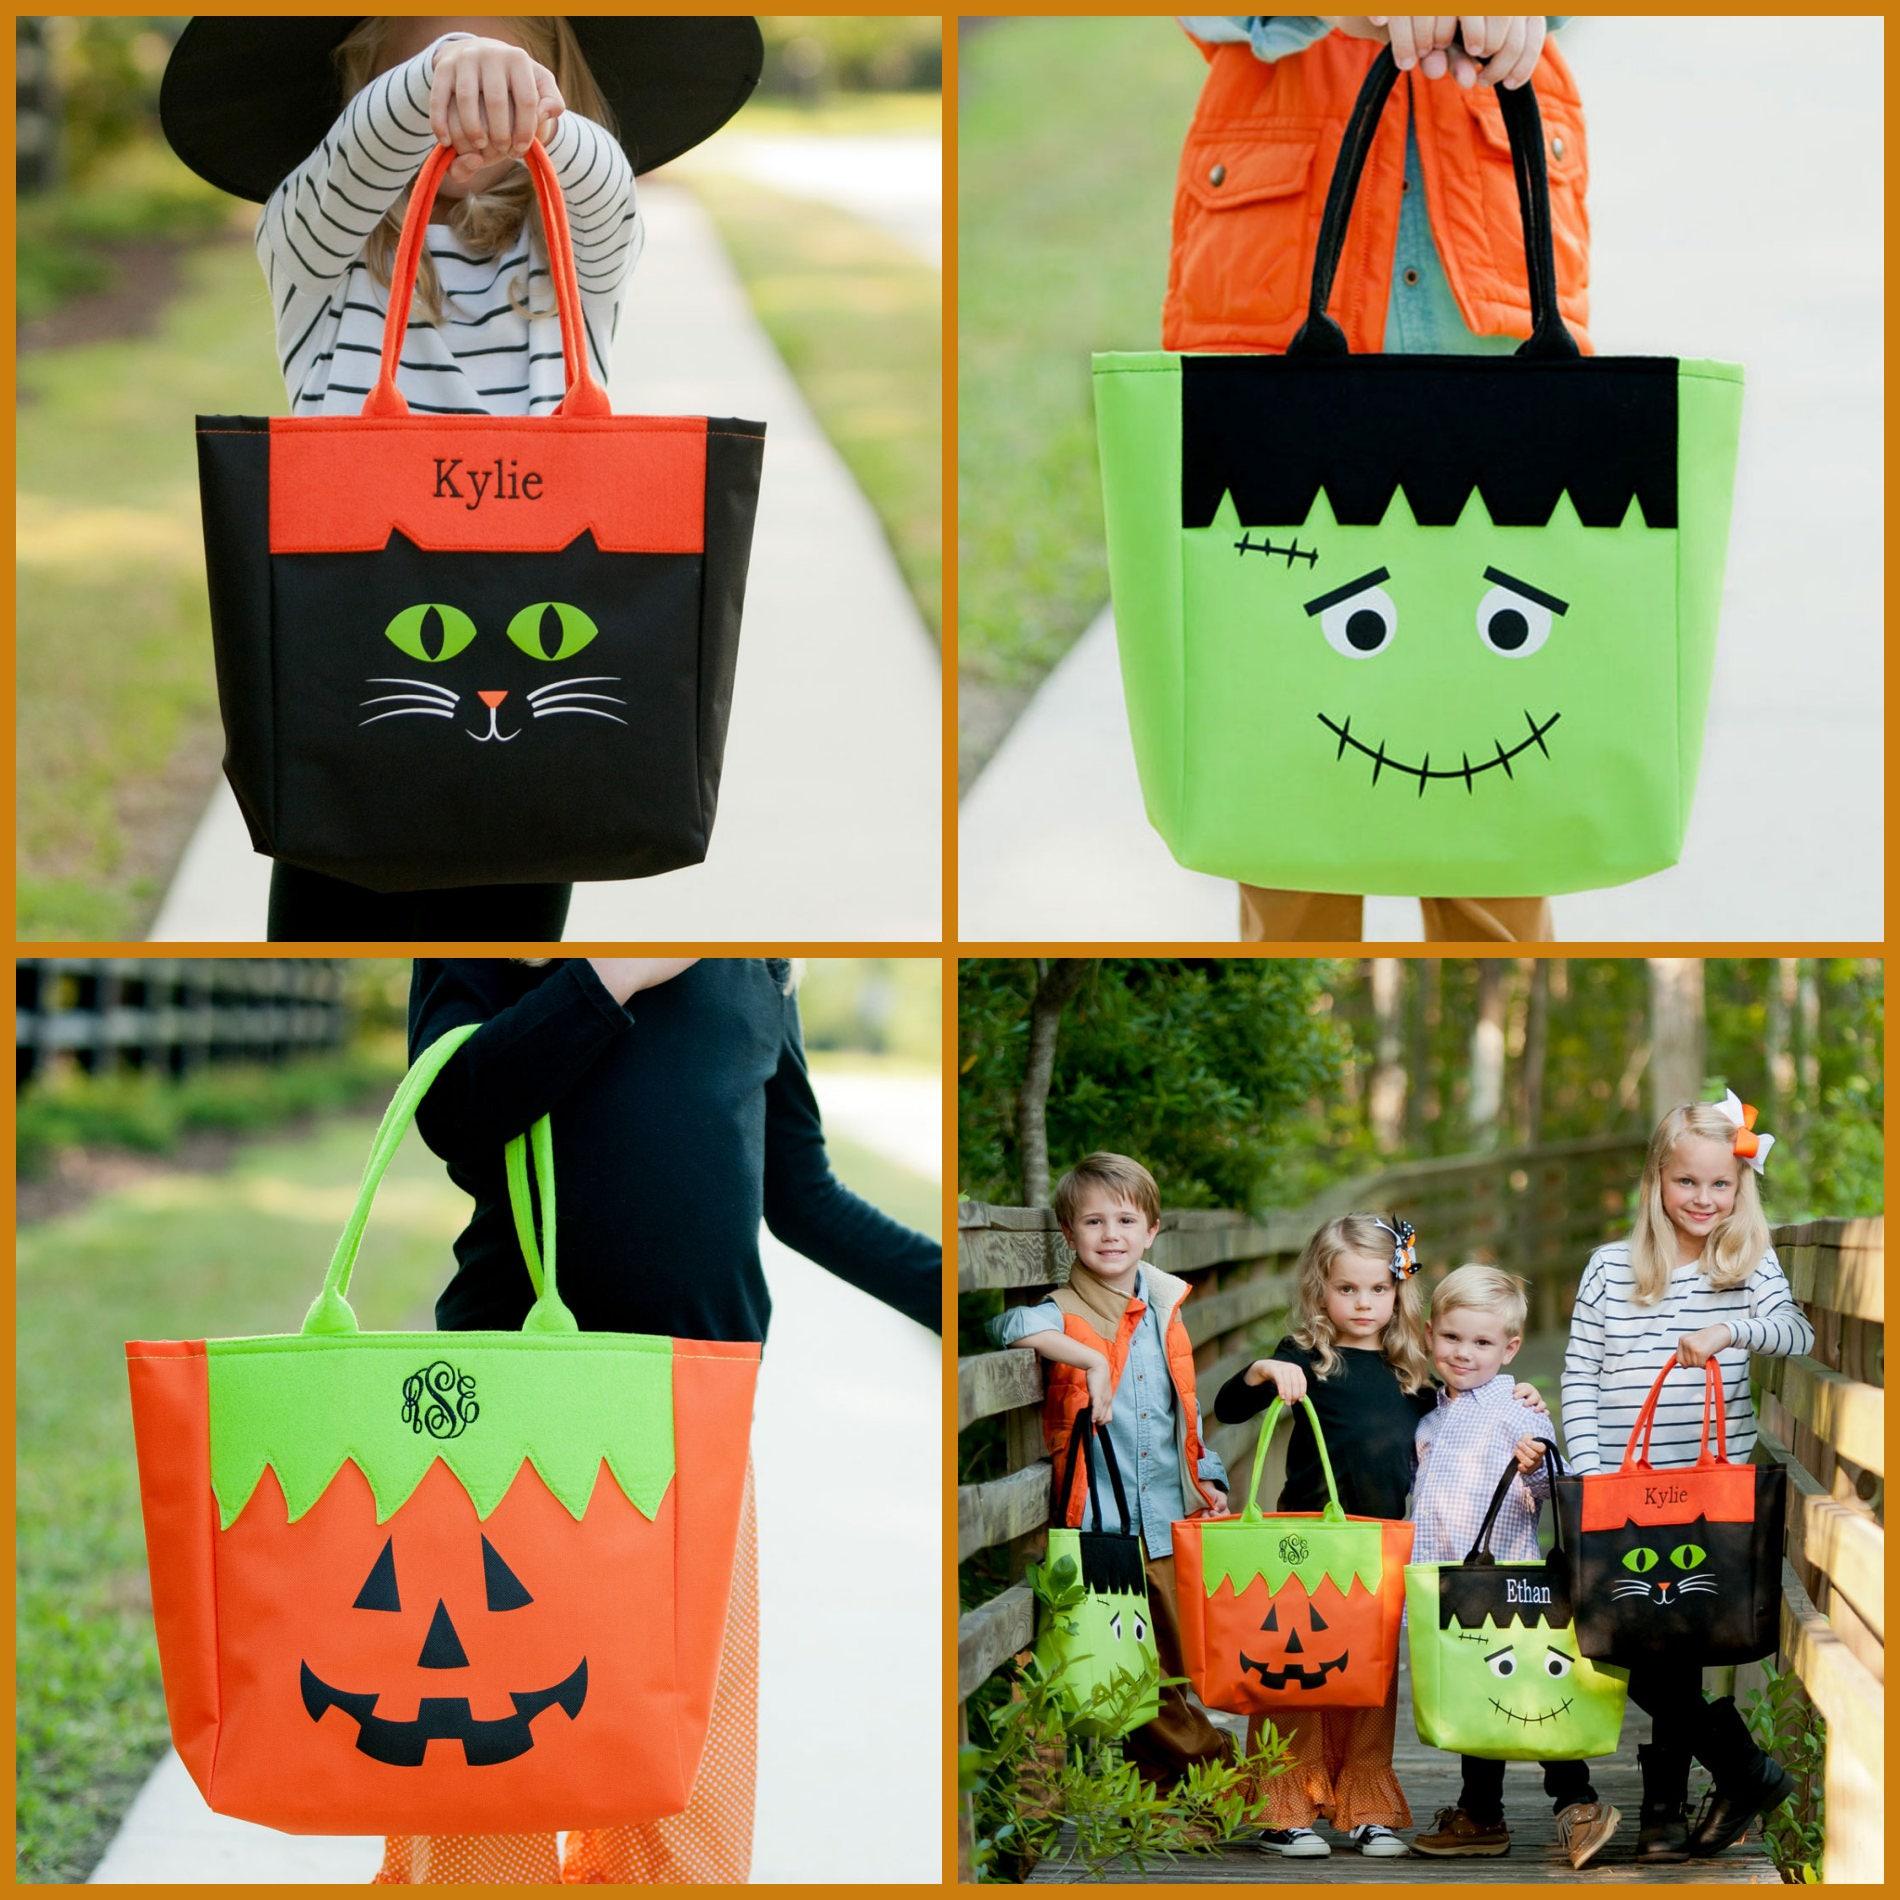 halloween tote halloween tote with monogram personalized halloween bag personalized tote bag